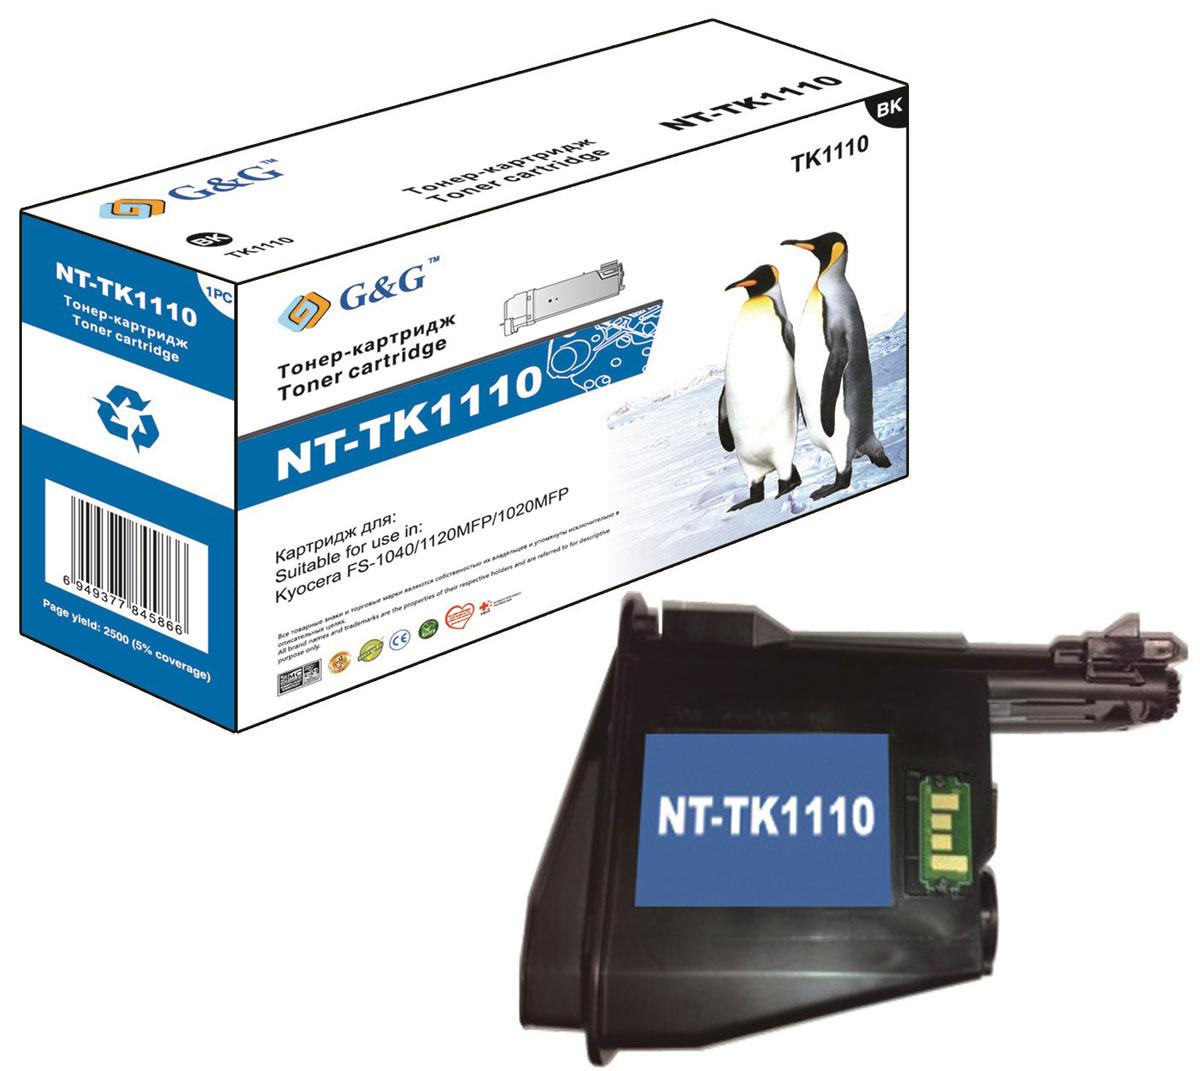 G&G NT-TK1110 тонер-картридж для Kyocera FS-1040/1020MFP/1120MFP tk1110 bk compatible toner cartridge for kyocera tk 1110 tk 1111 tk 1112 fs 1020 fs 1040 fs 1120 fs 1120mfp 2 5k free shipping